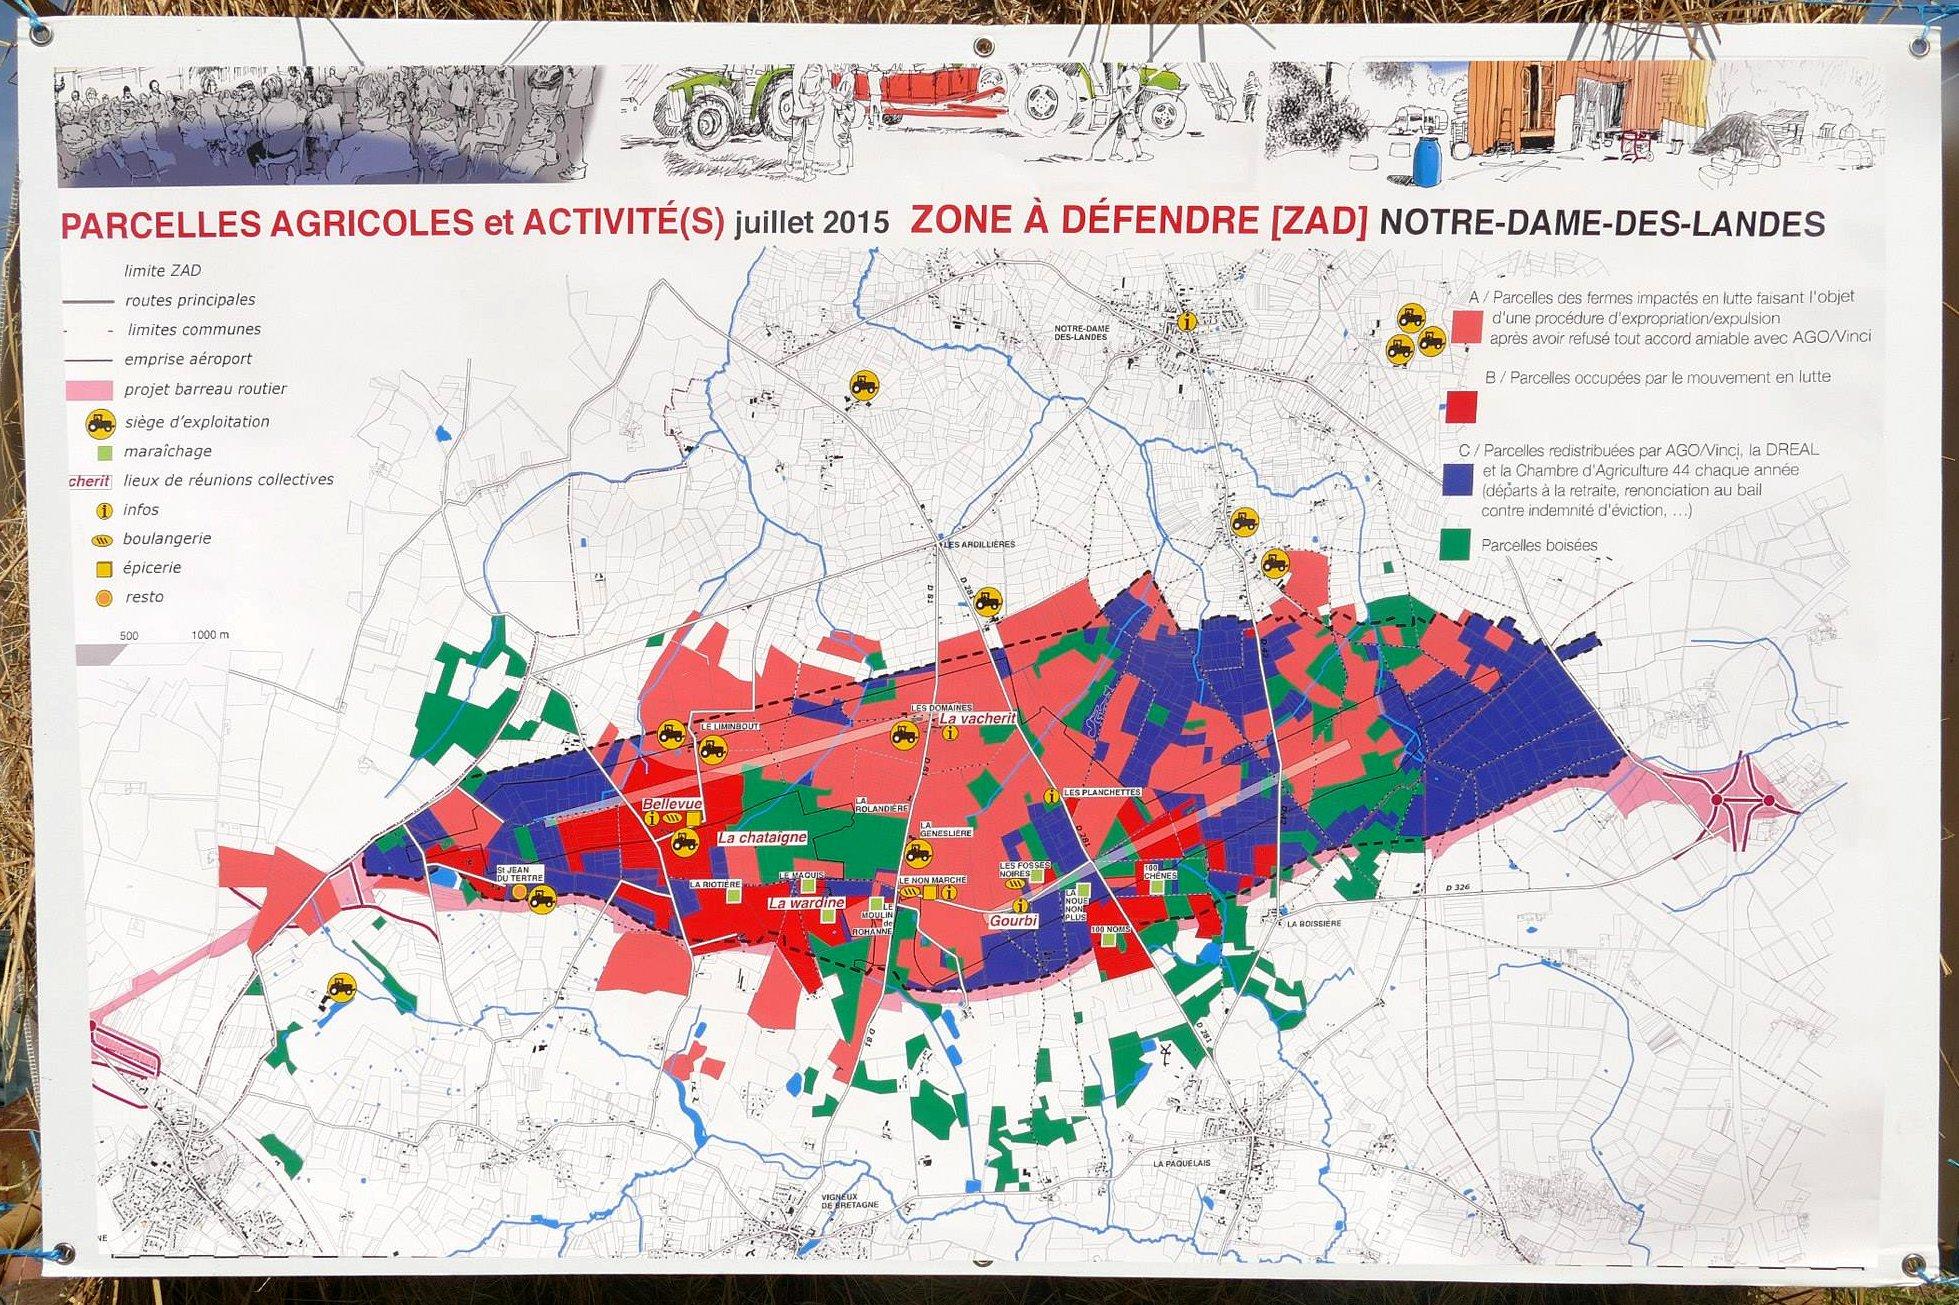 2015-07-21_NDDL-agri-map